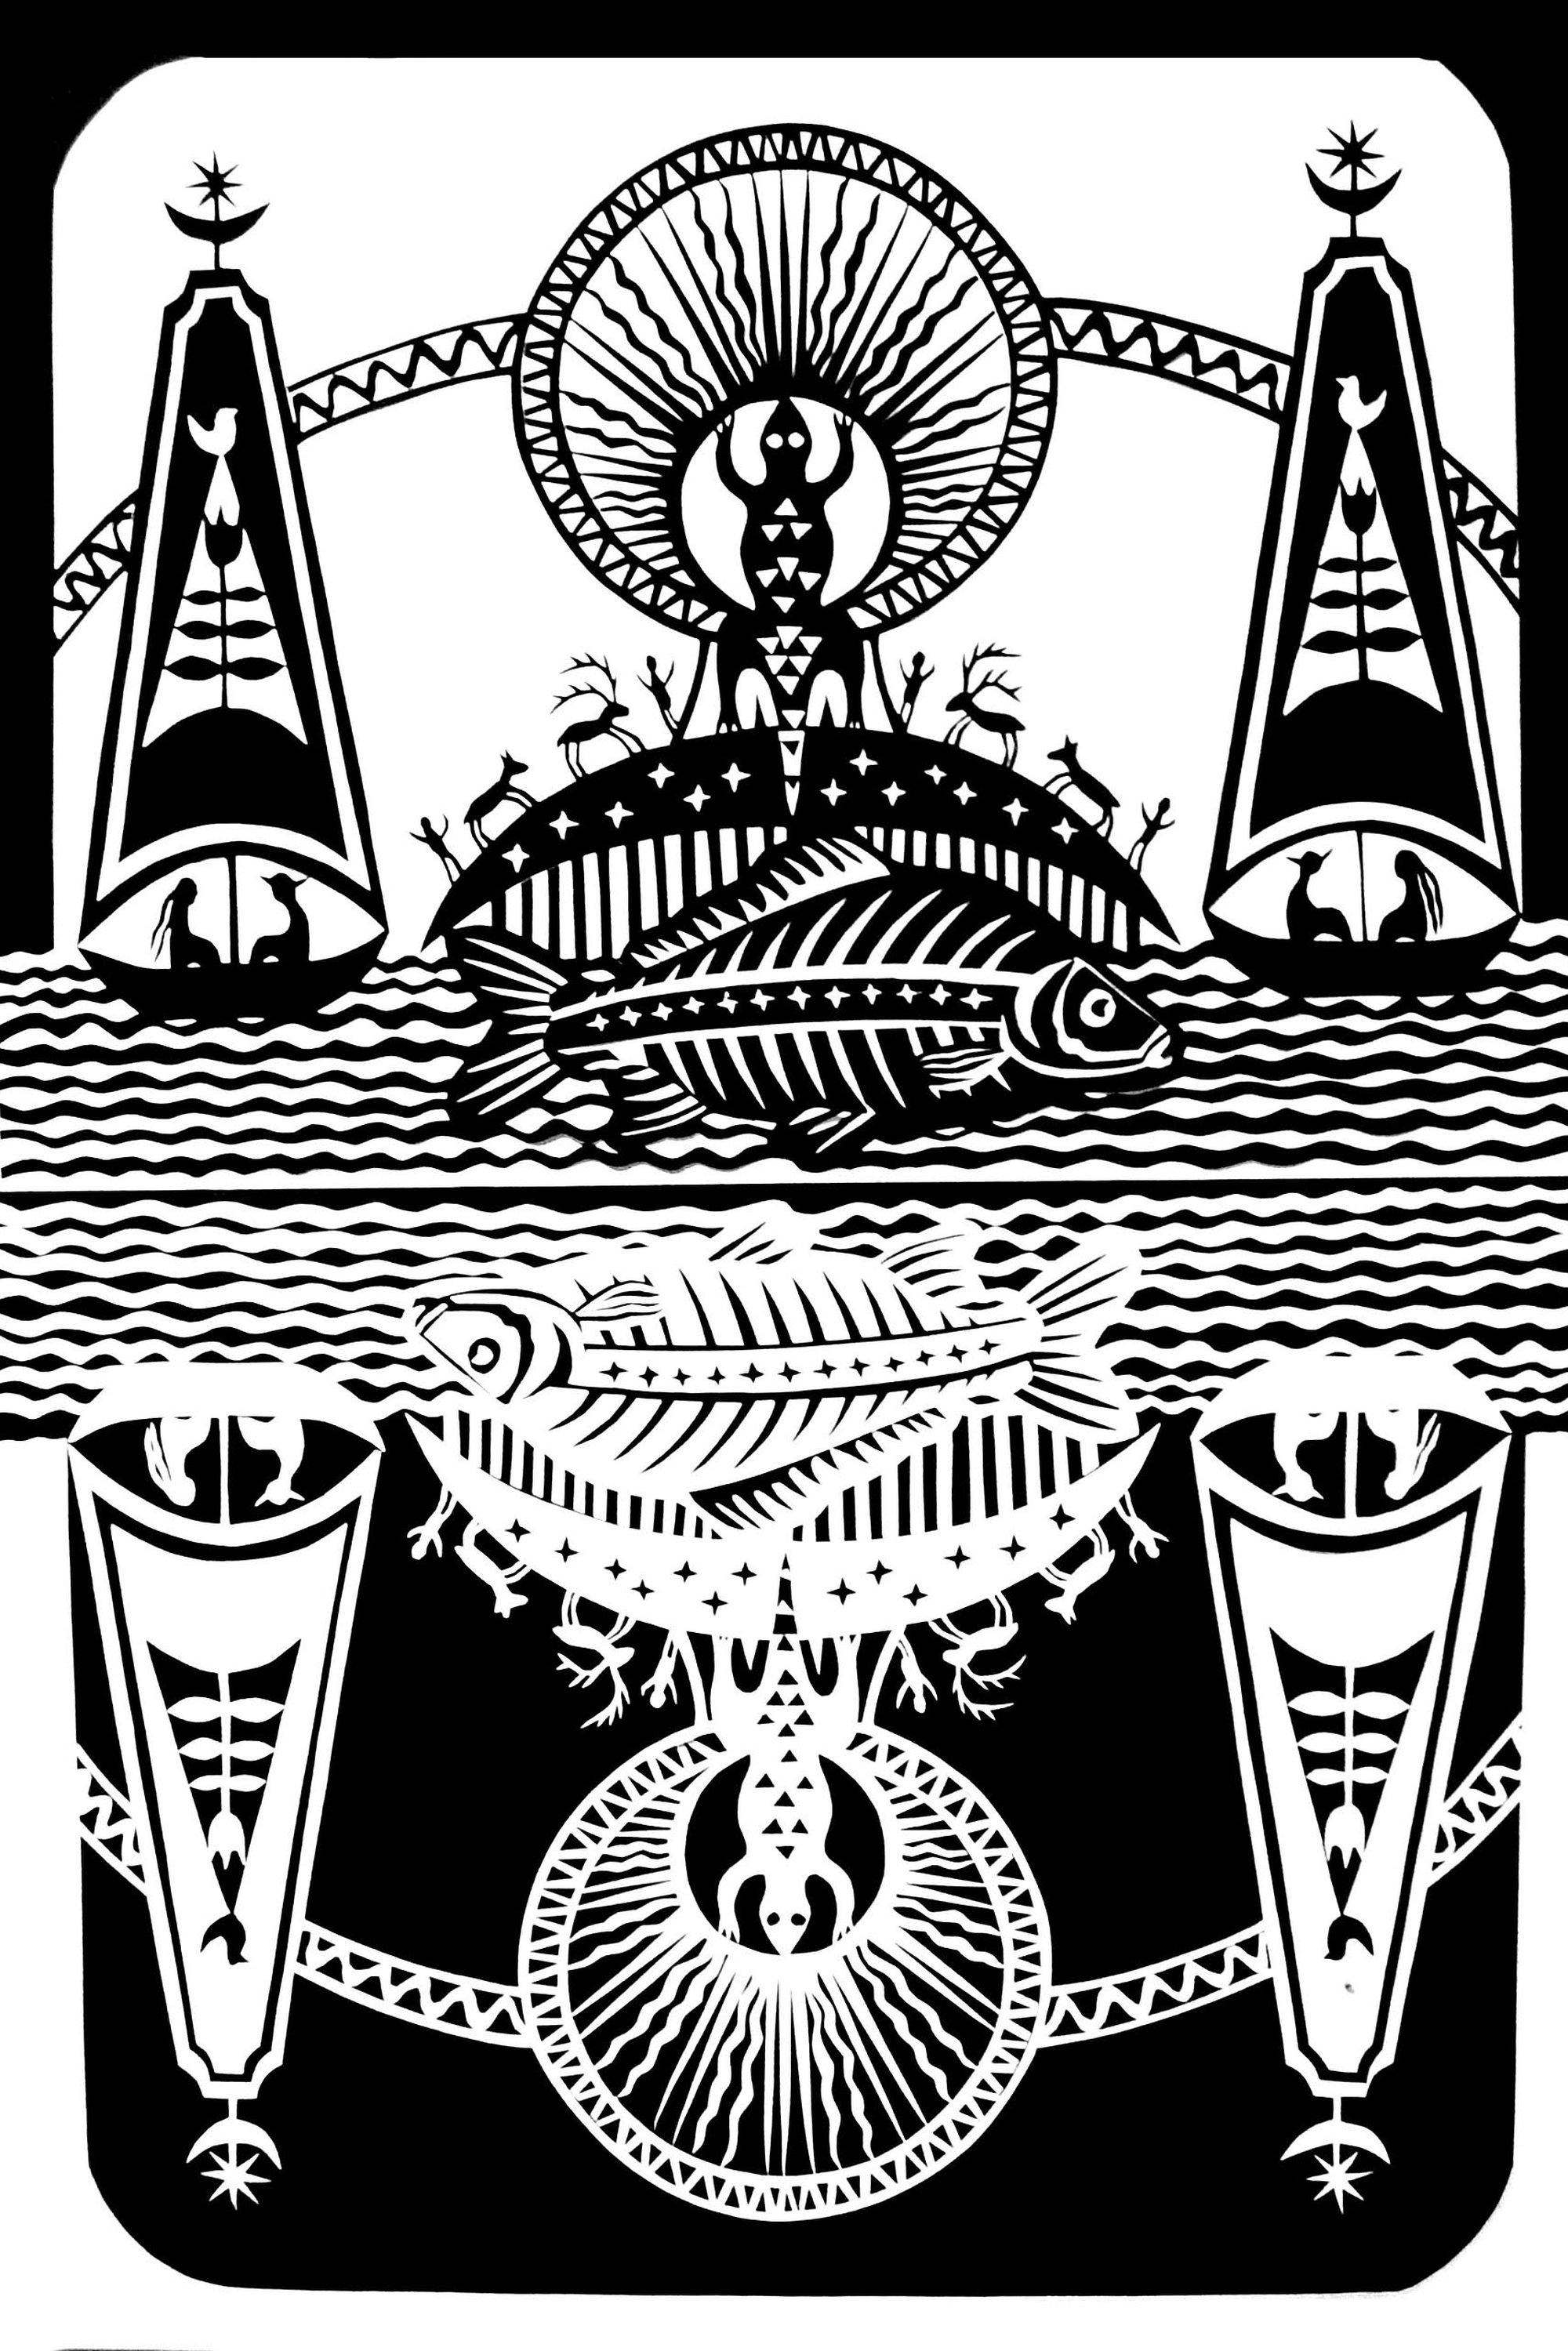 V. Visockienės karpinys